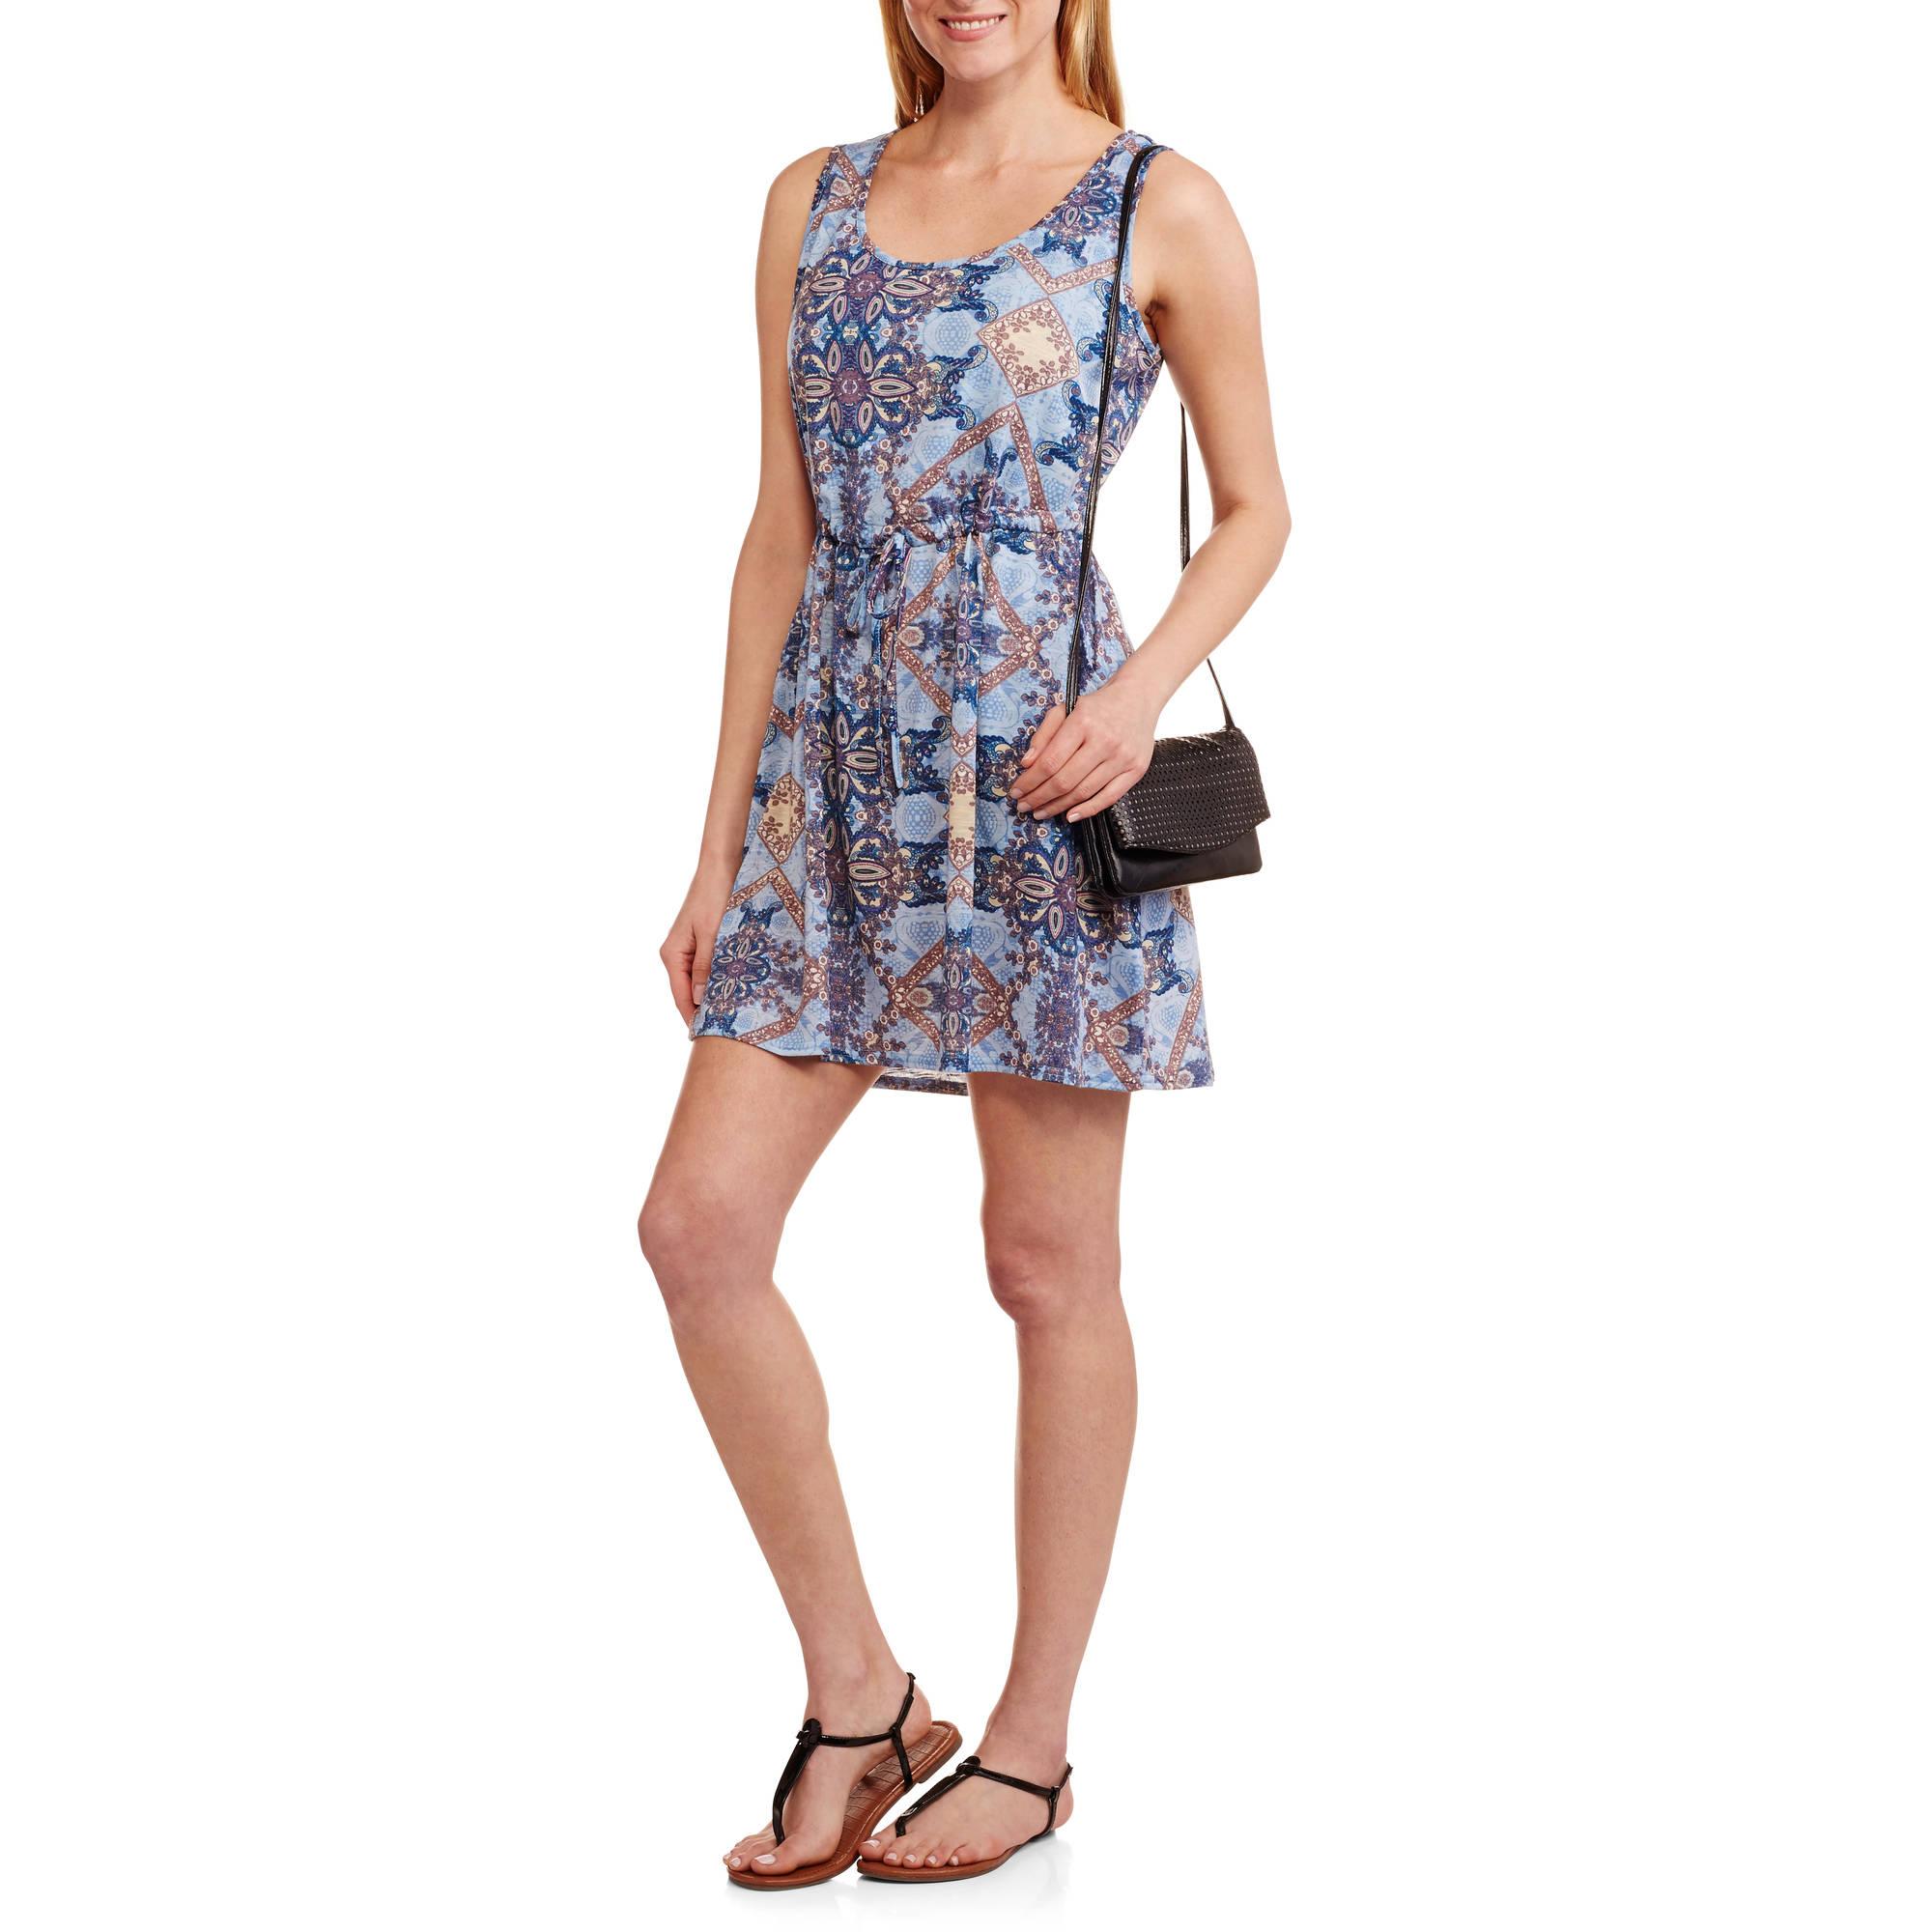 Walmart clothing for women